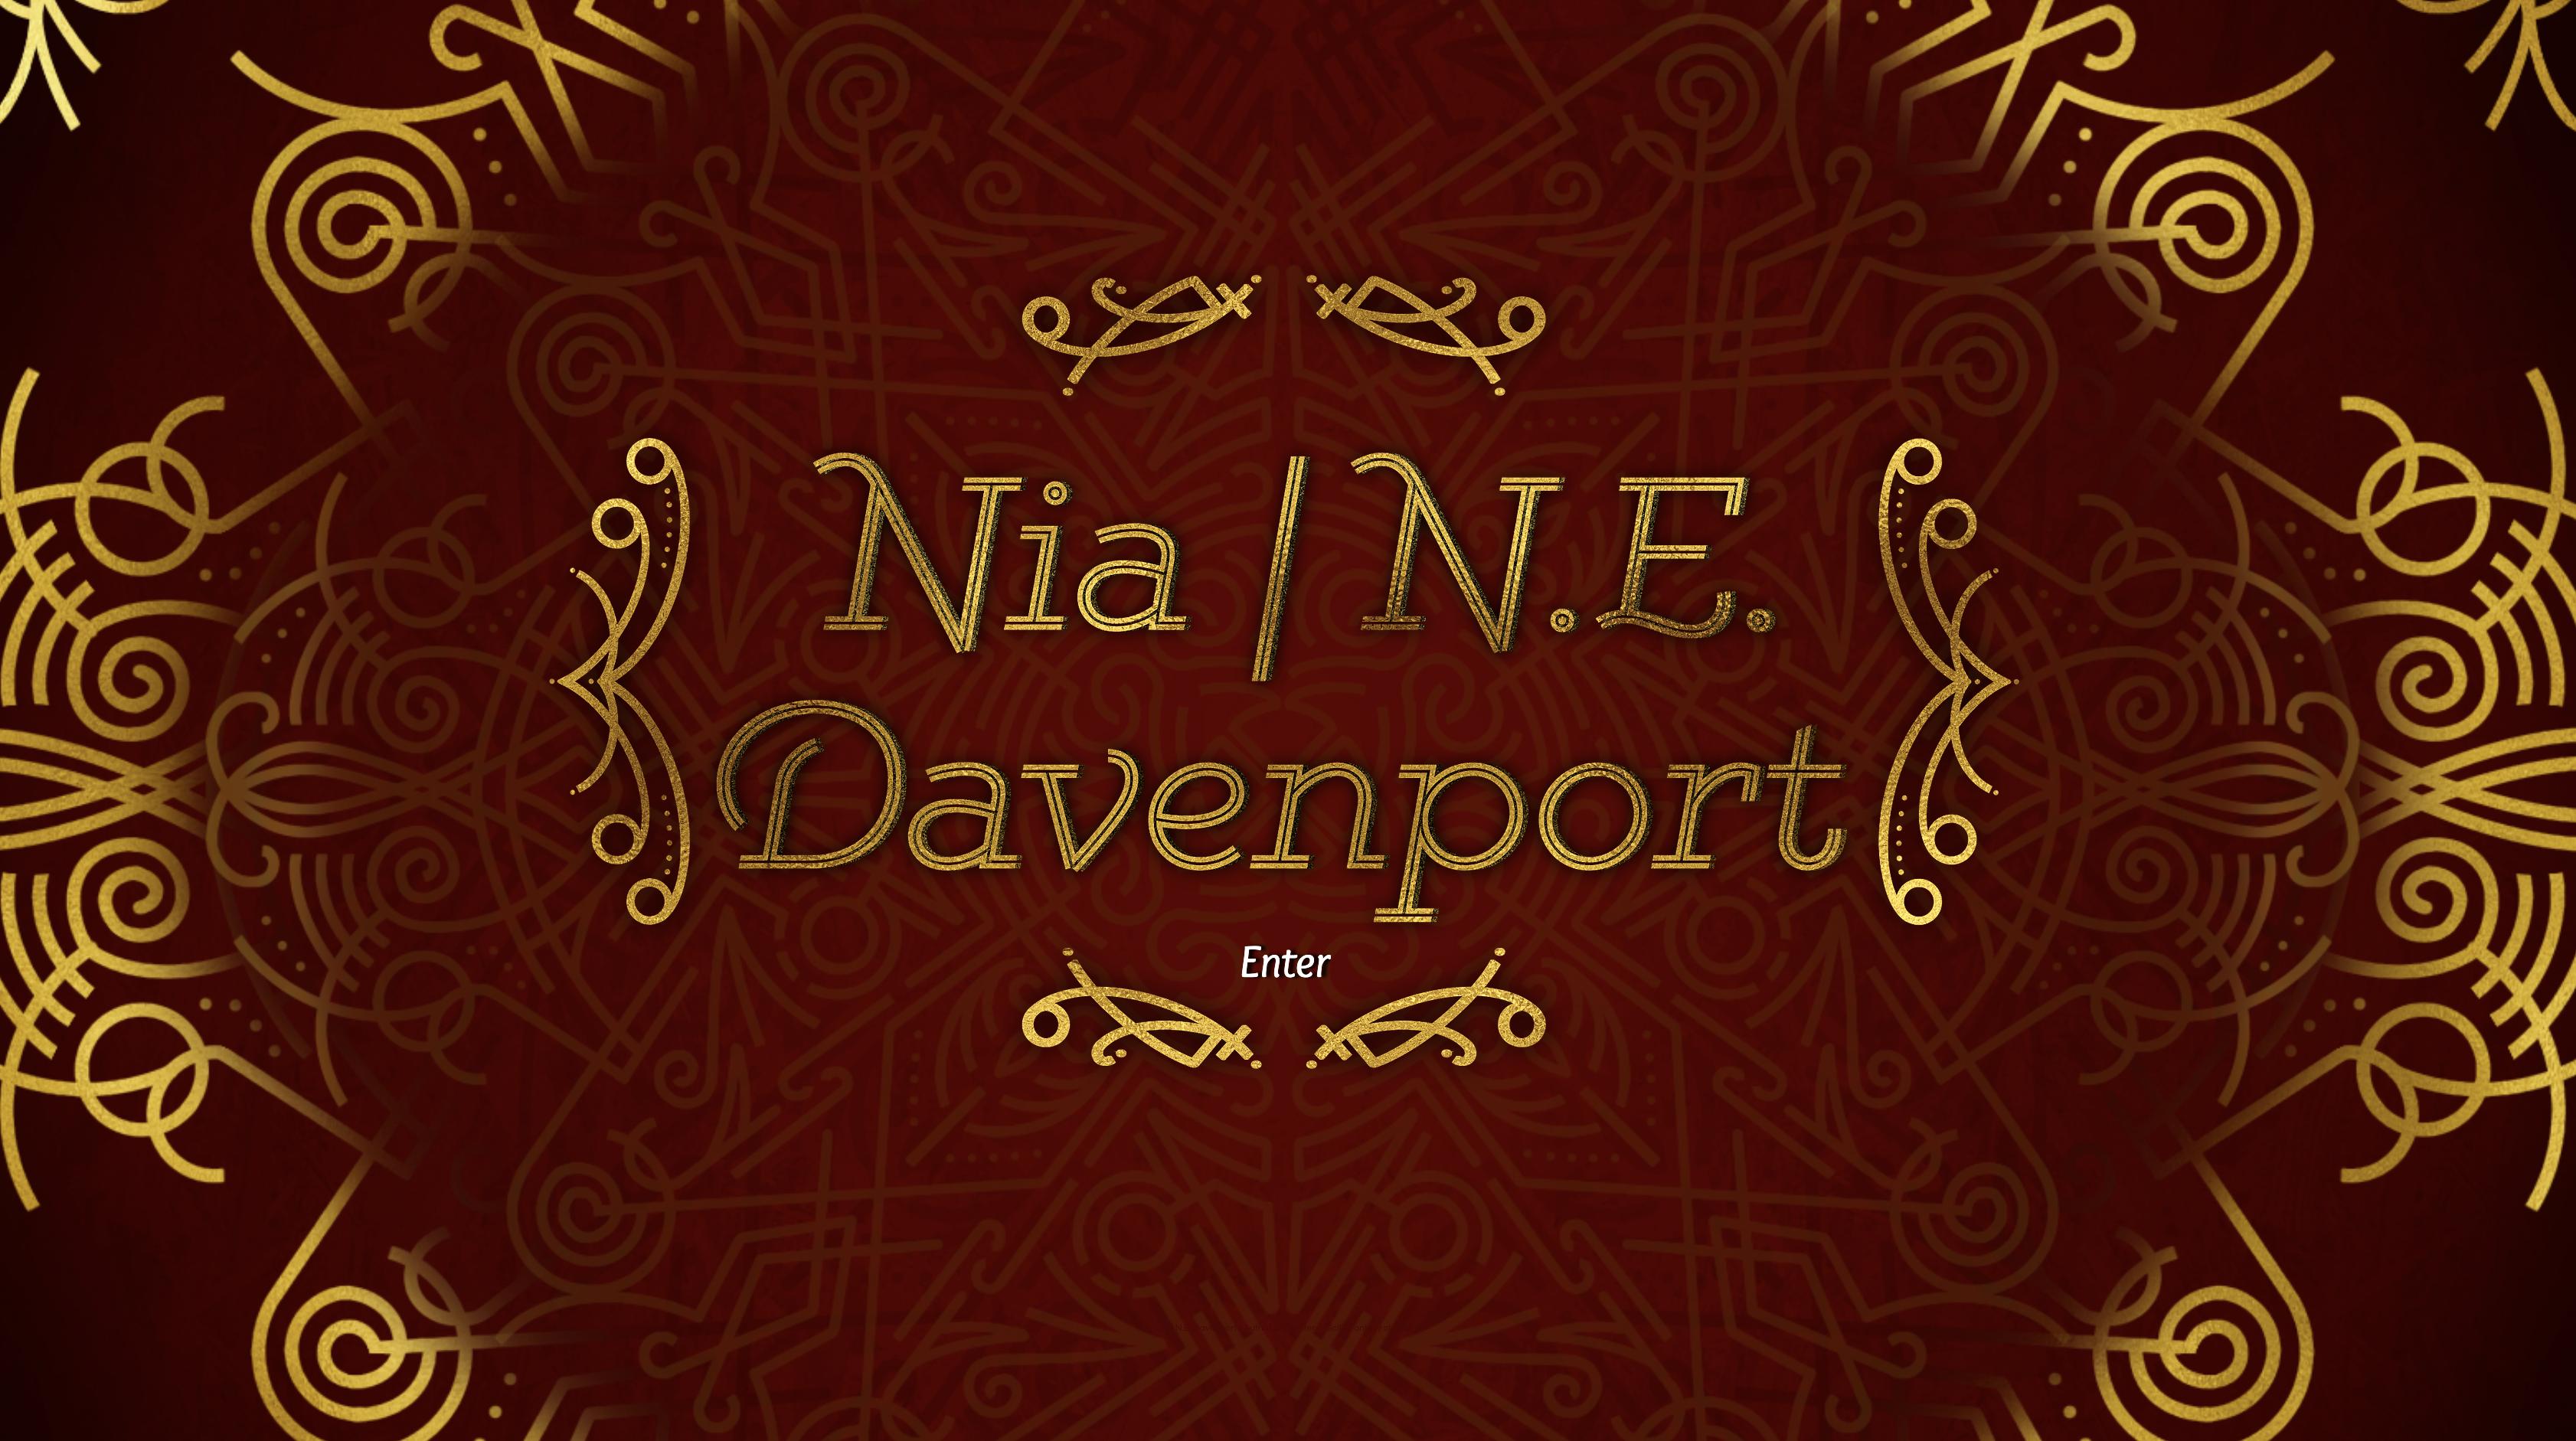 Nia Davenport